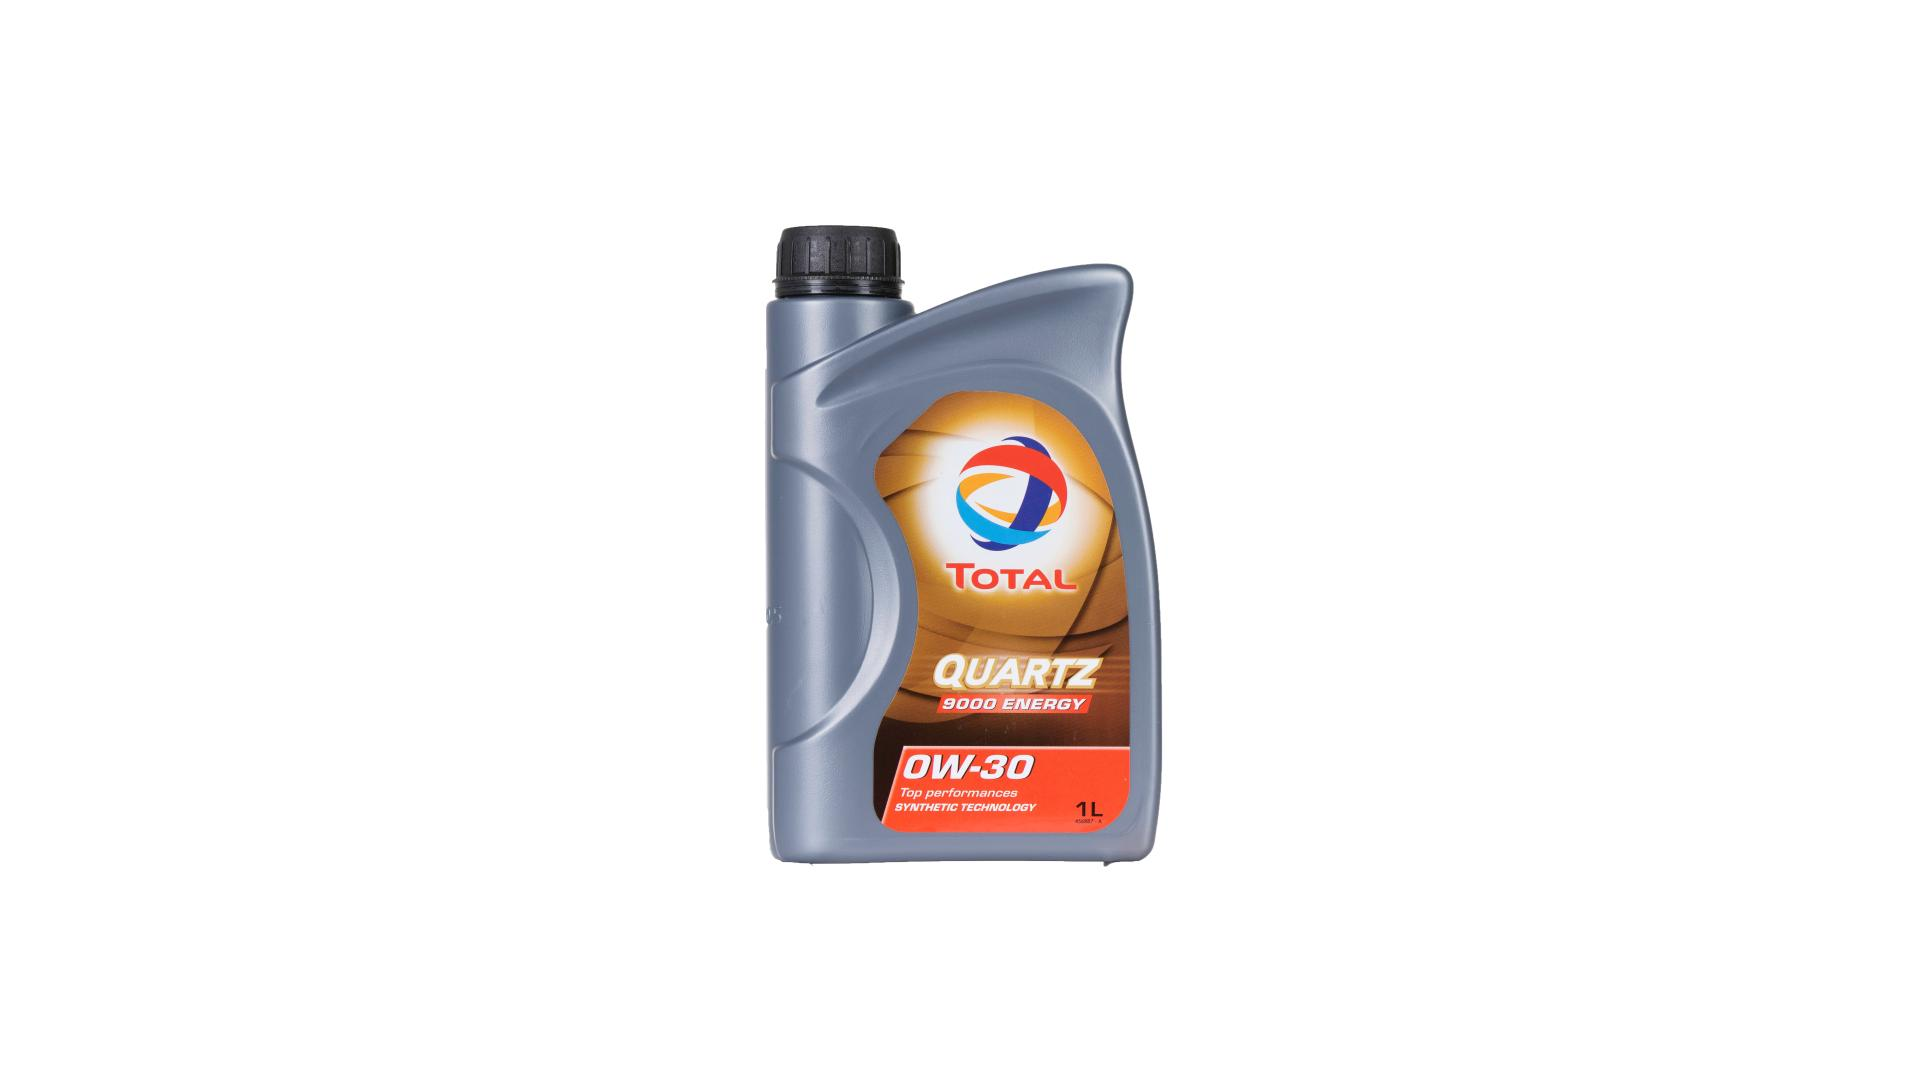 Total 0w-30 Quartz Energy 9000 1L (166249)